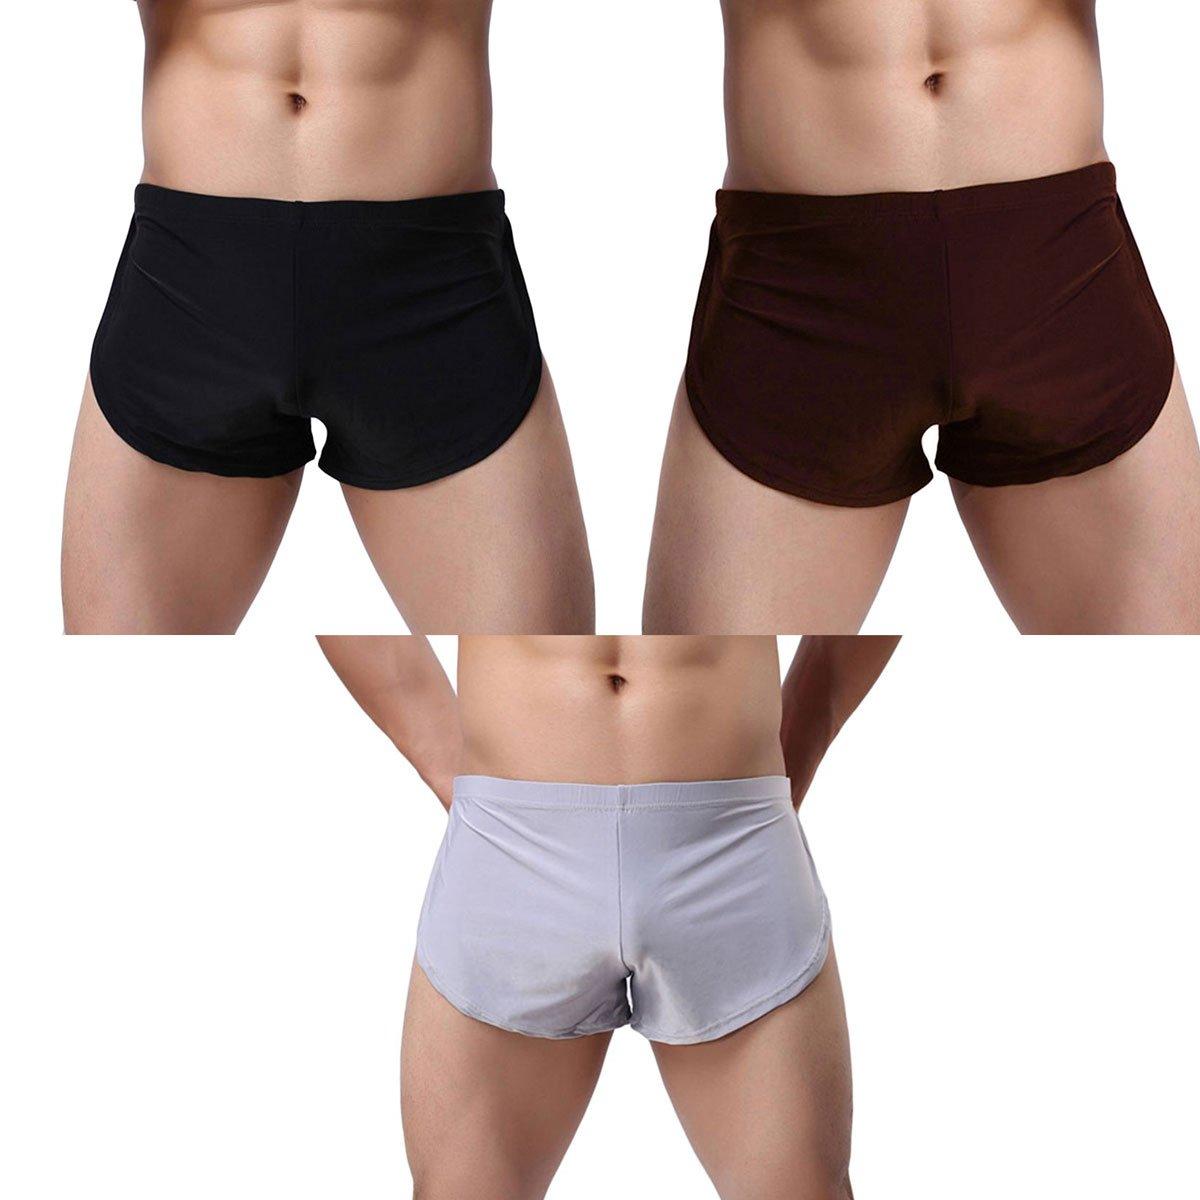 Banana Bucket Men's Split Side Sexy Breathable Boxer Underwear  3-pack Black+coffe+grey 33-36 inches